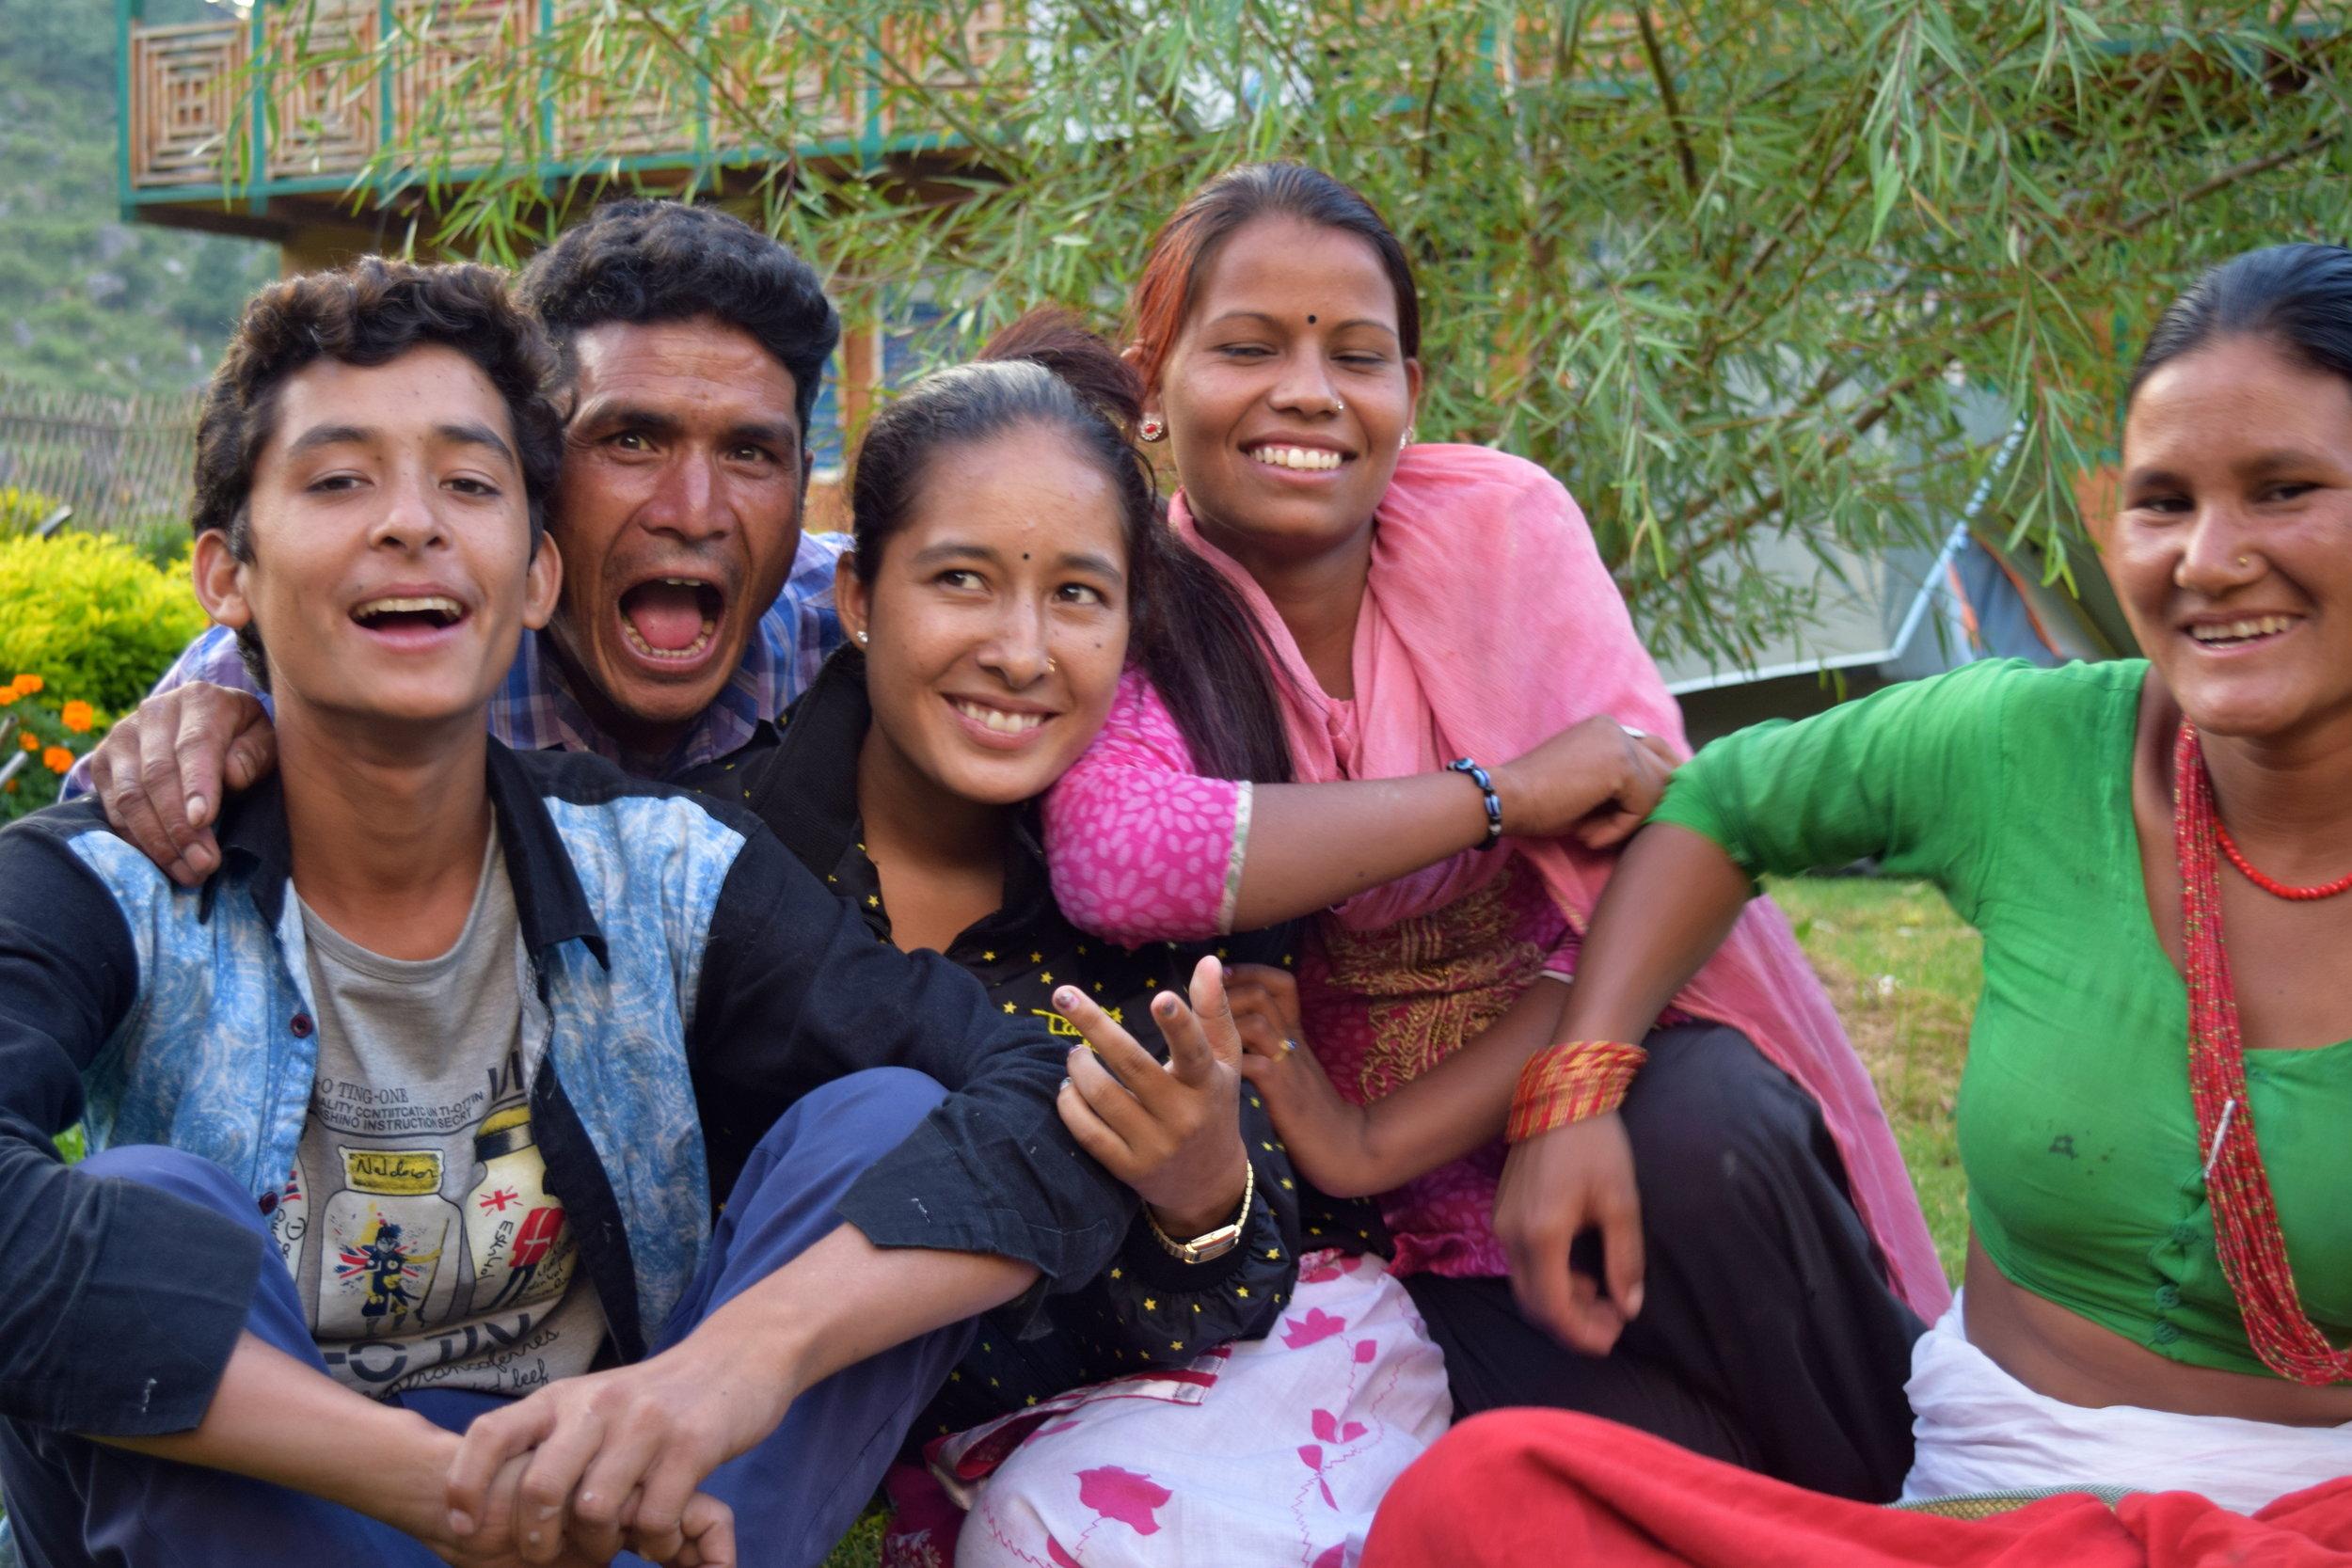 Oda Foundation staff from left to right: Bakhat, Prem, Khalasha, Binita, Sani Kanchi